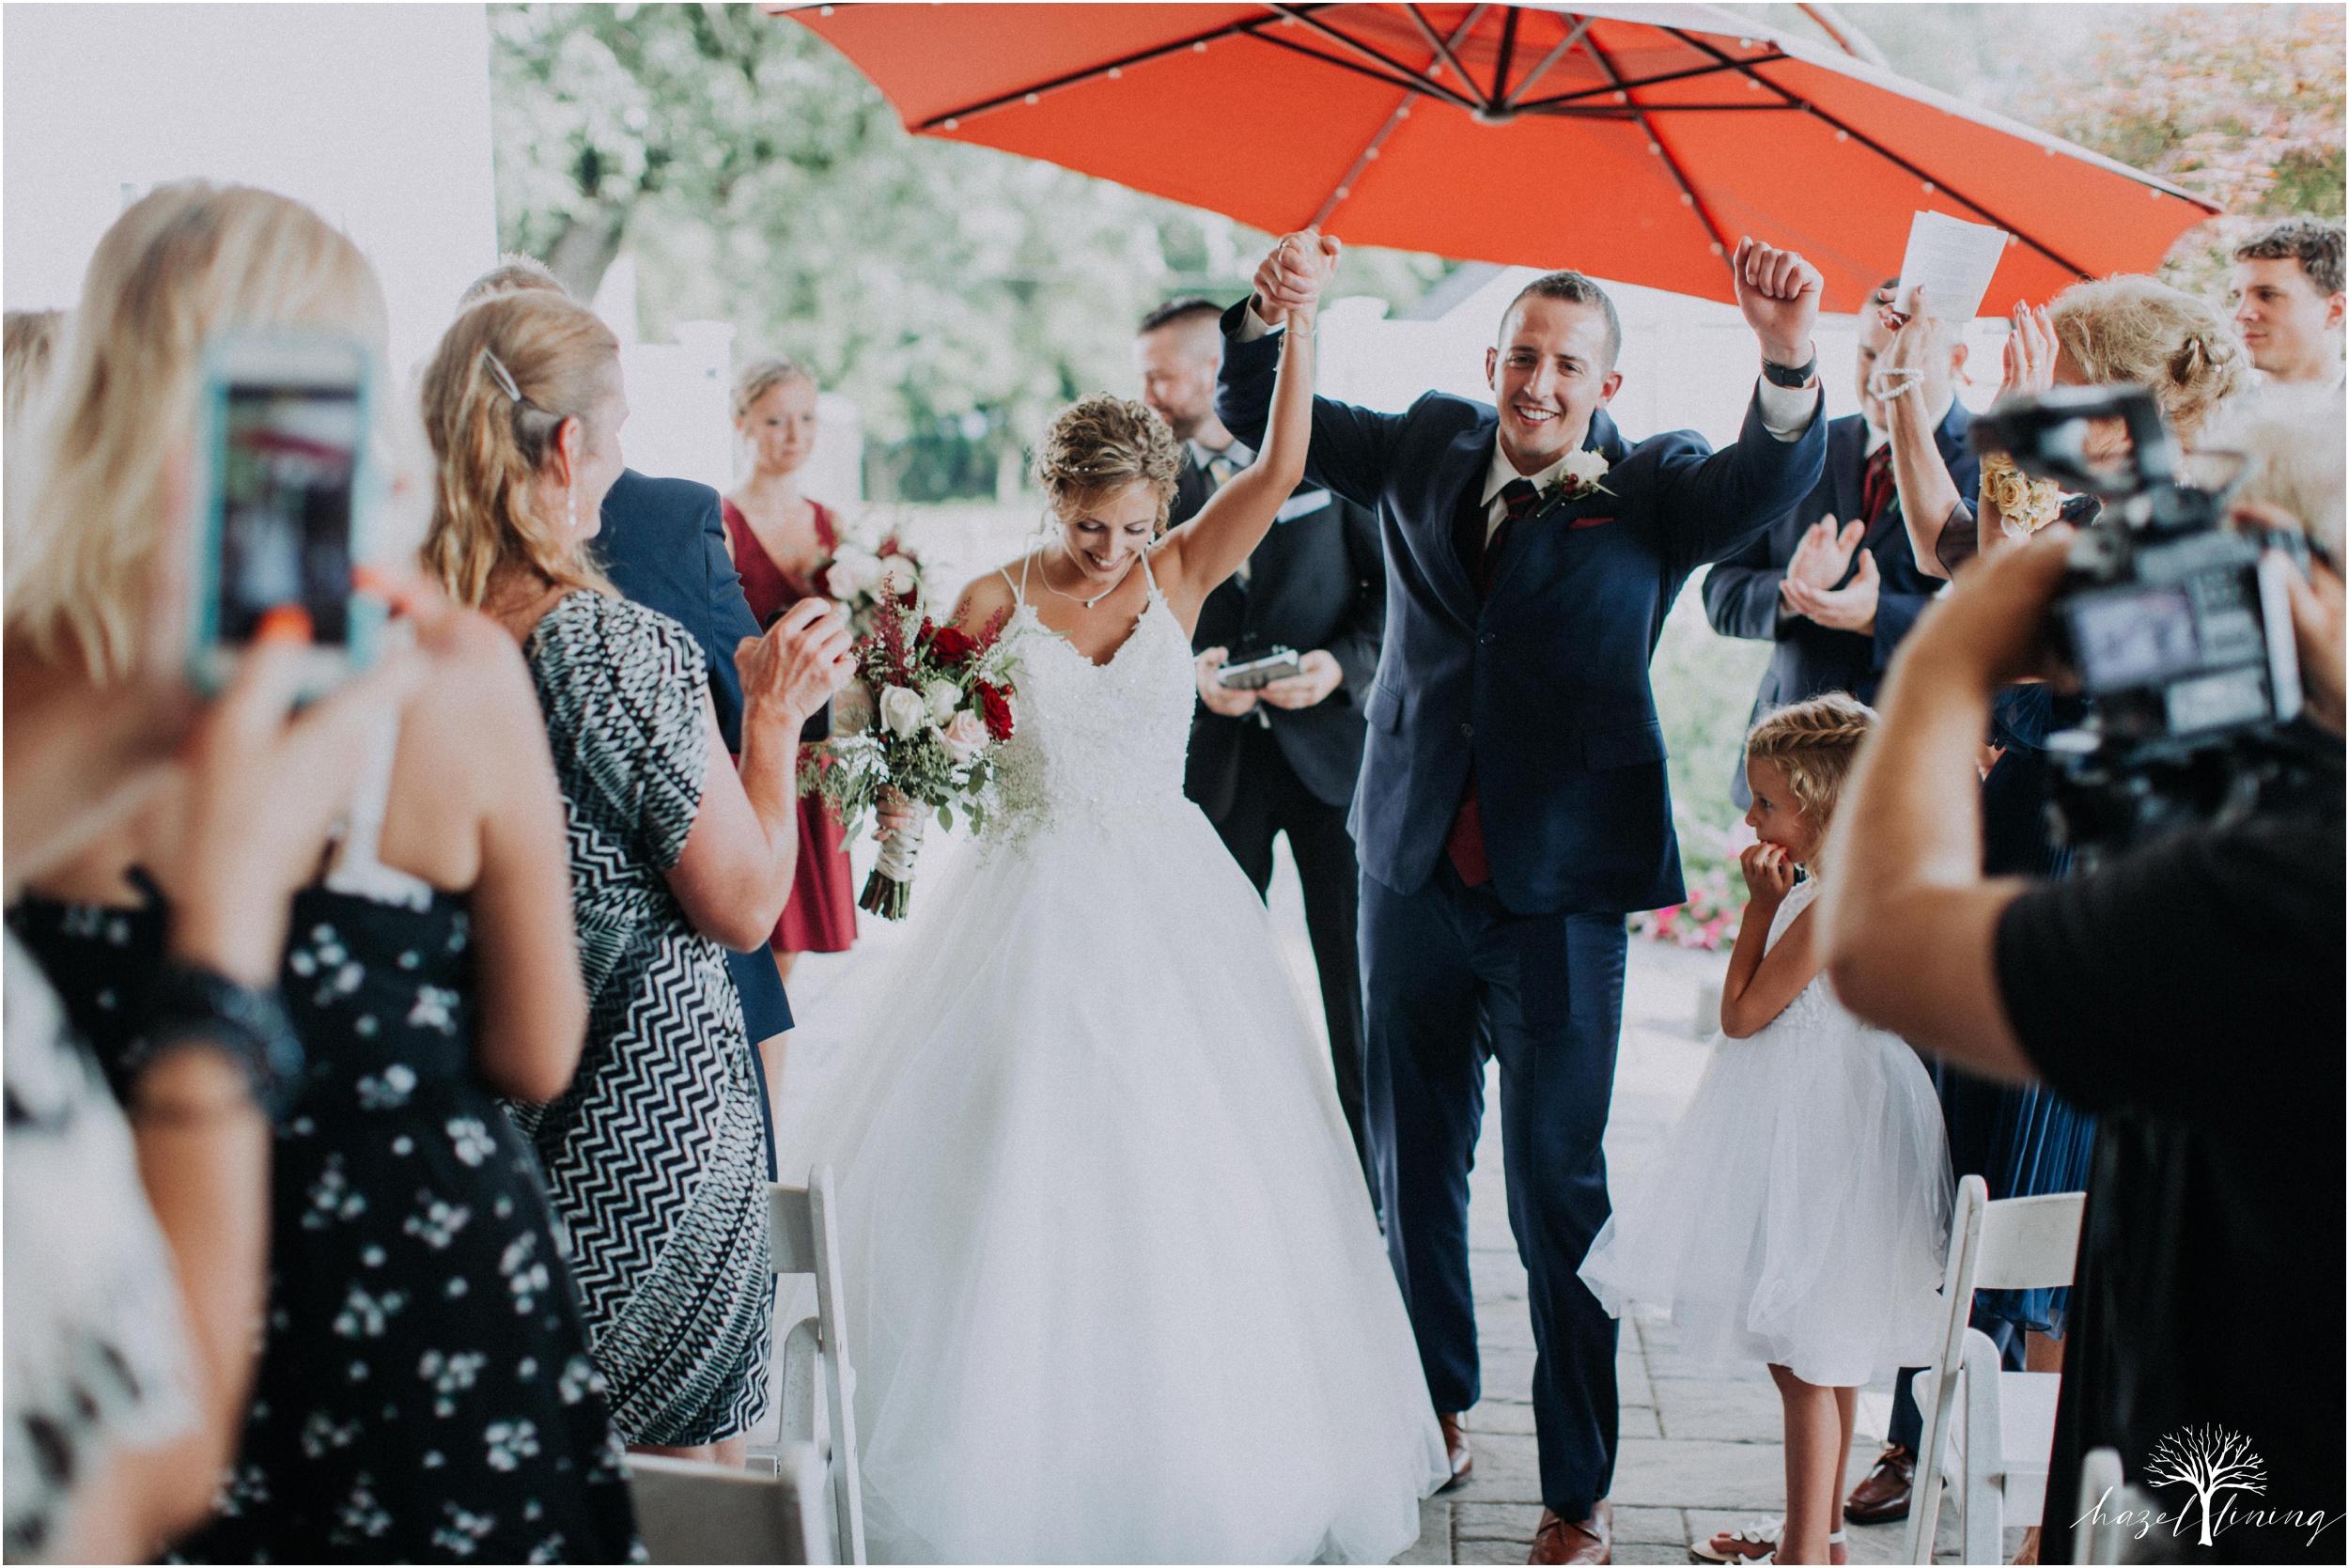 jonathan-weibel-becky-haywood-loft-at-sweetwater-cc-pennsburg-pennsylvania-rainy-day-summer-wedding-hazel-lining-travel-wedding-elopement-photography_0059.jpg